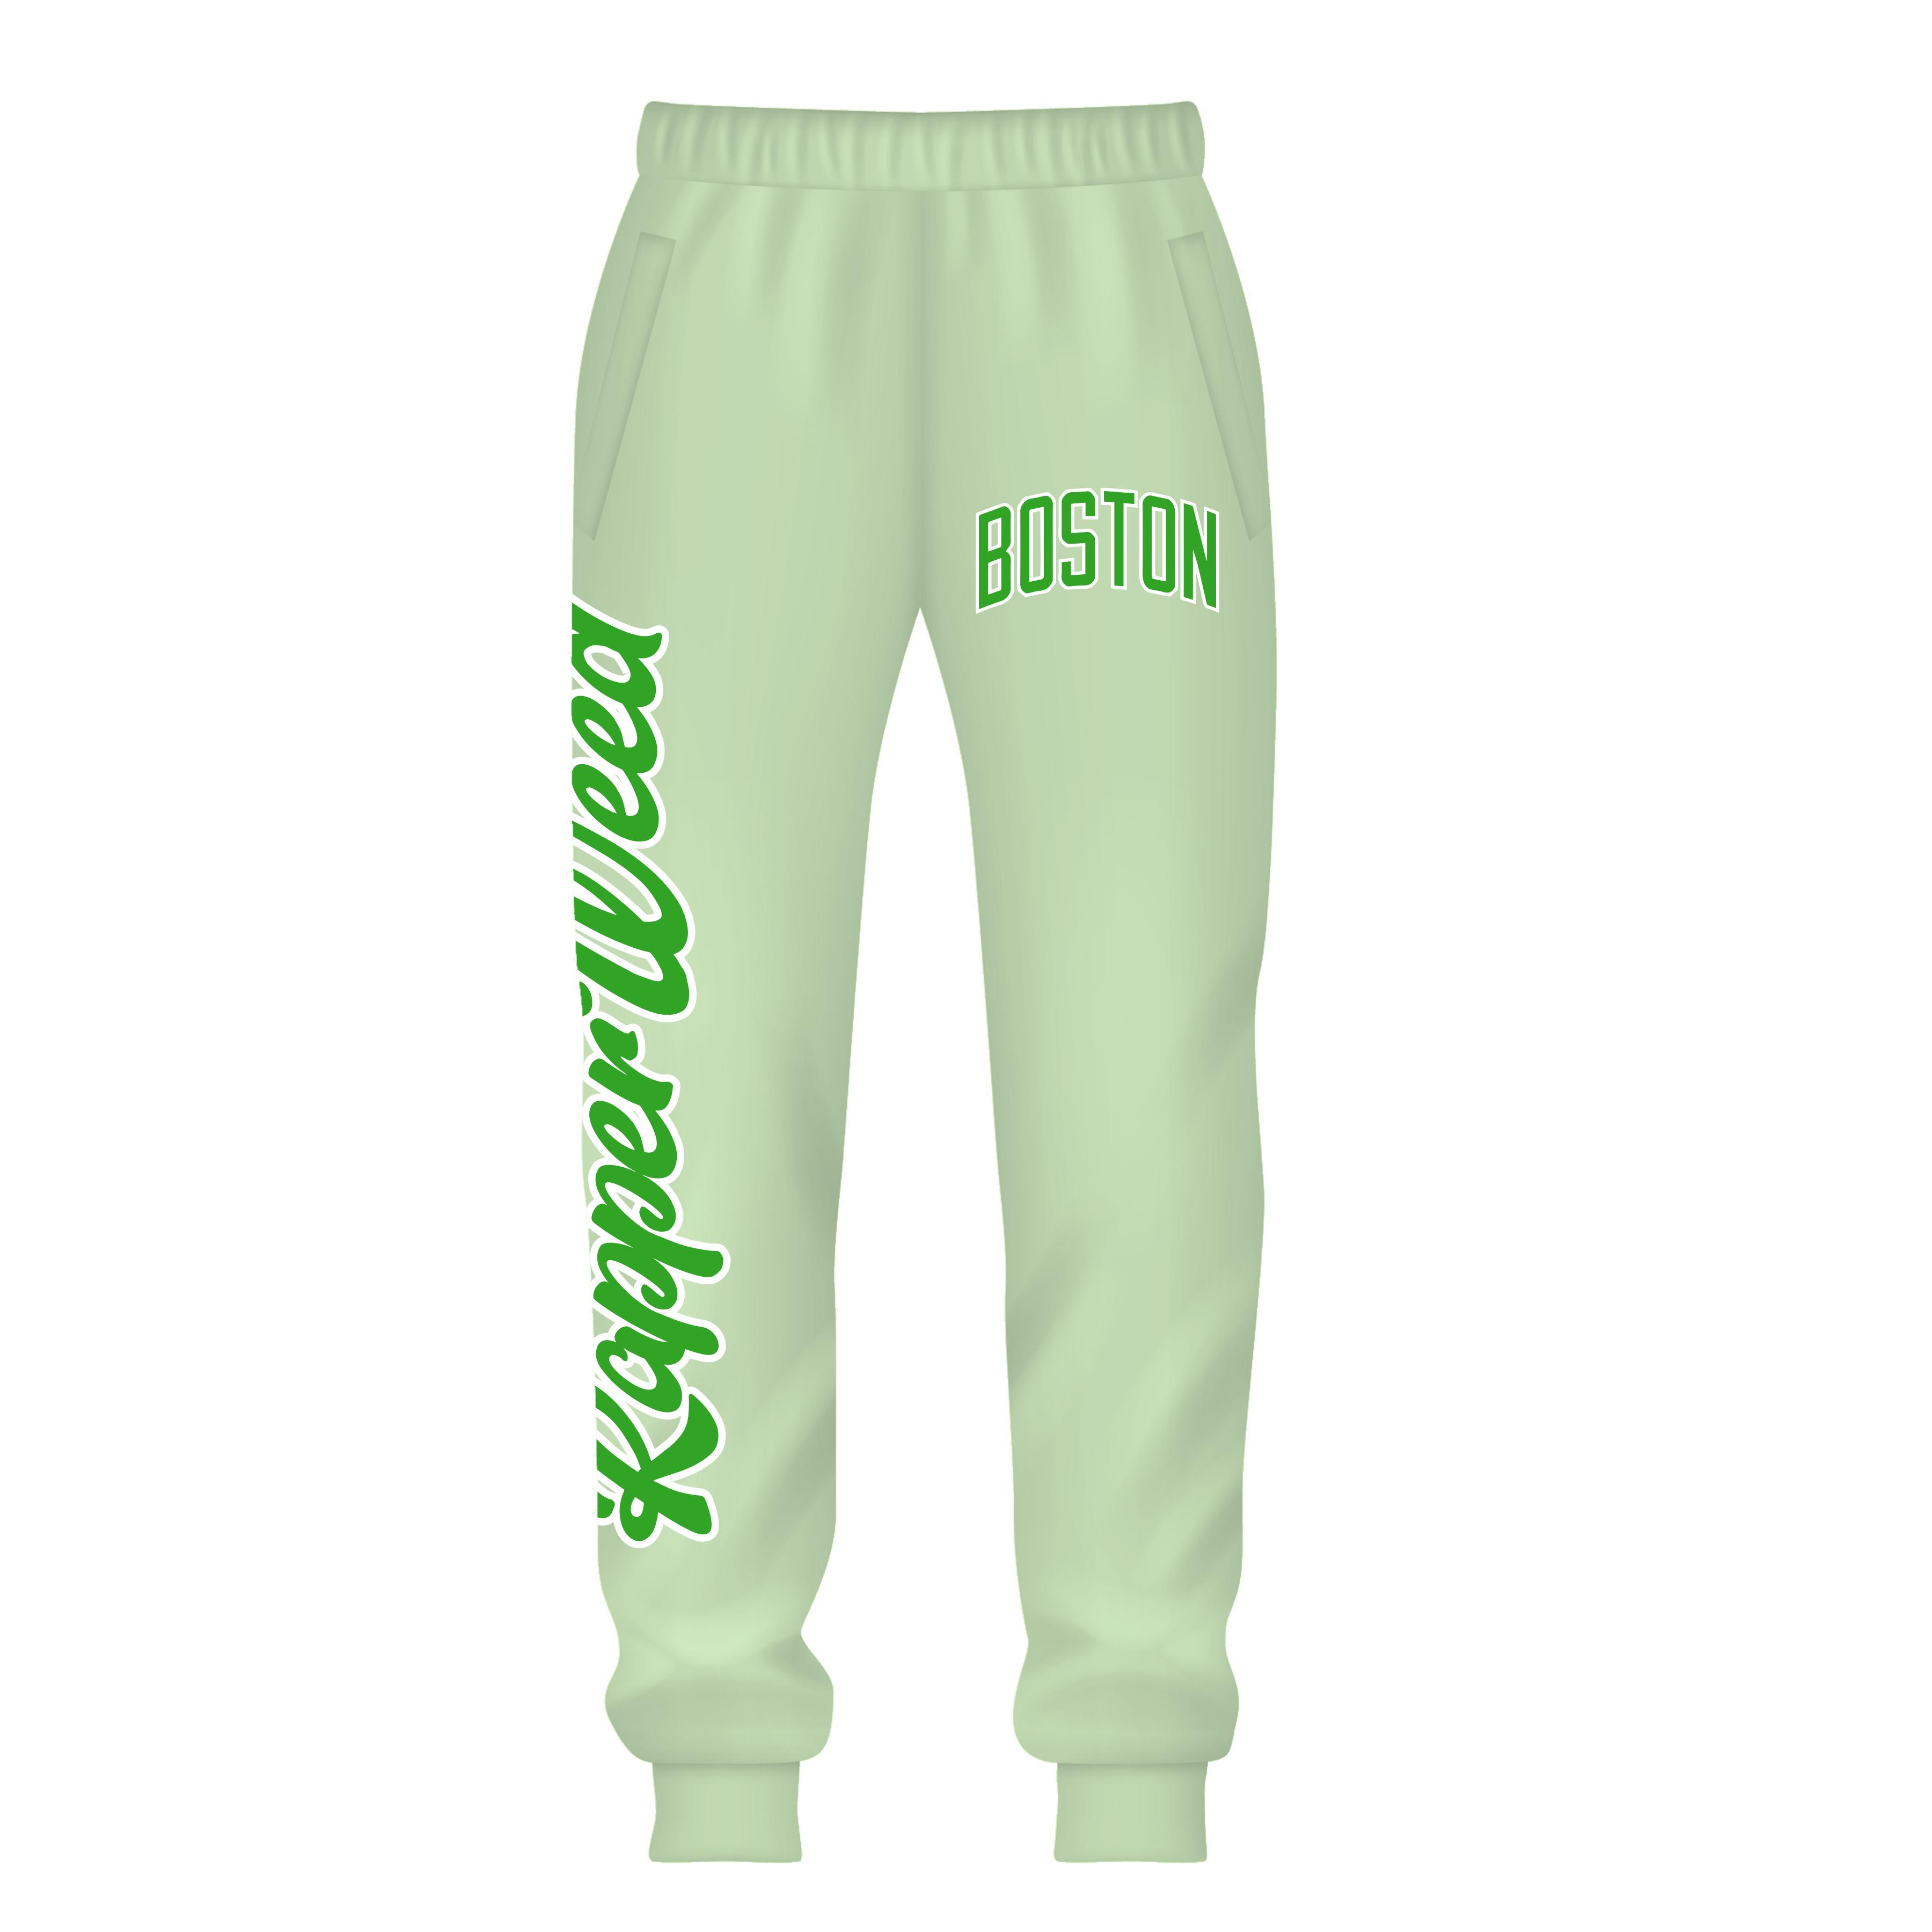 RW Boston Sweatpants